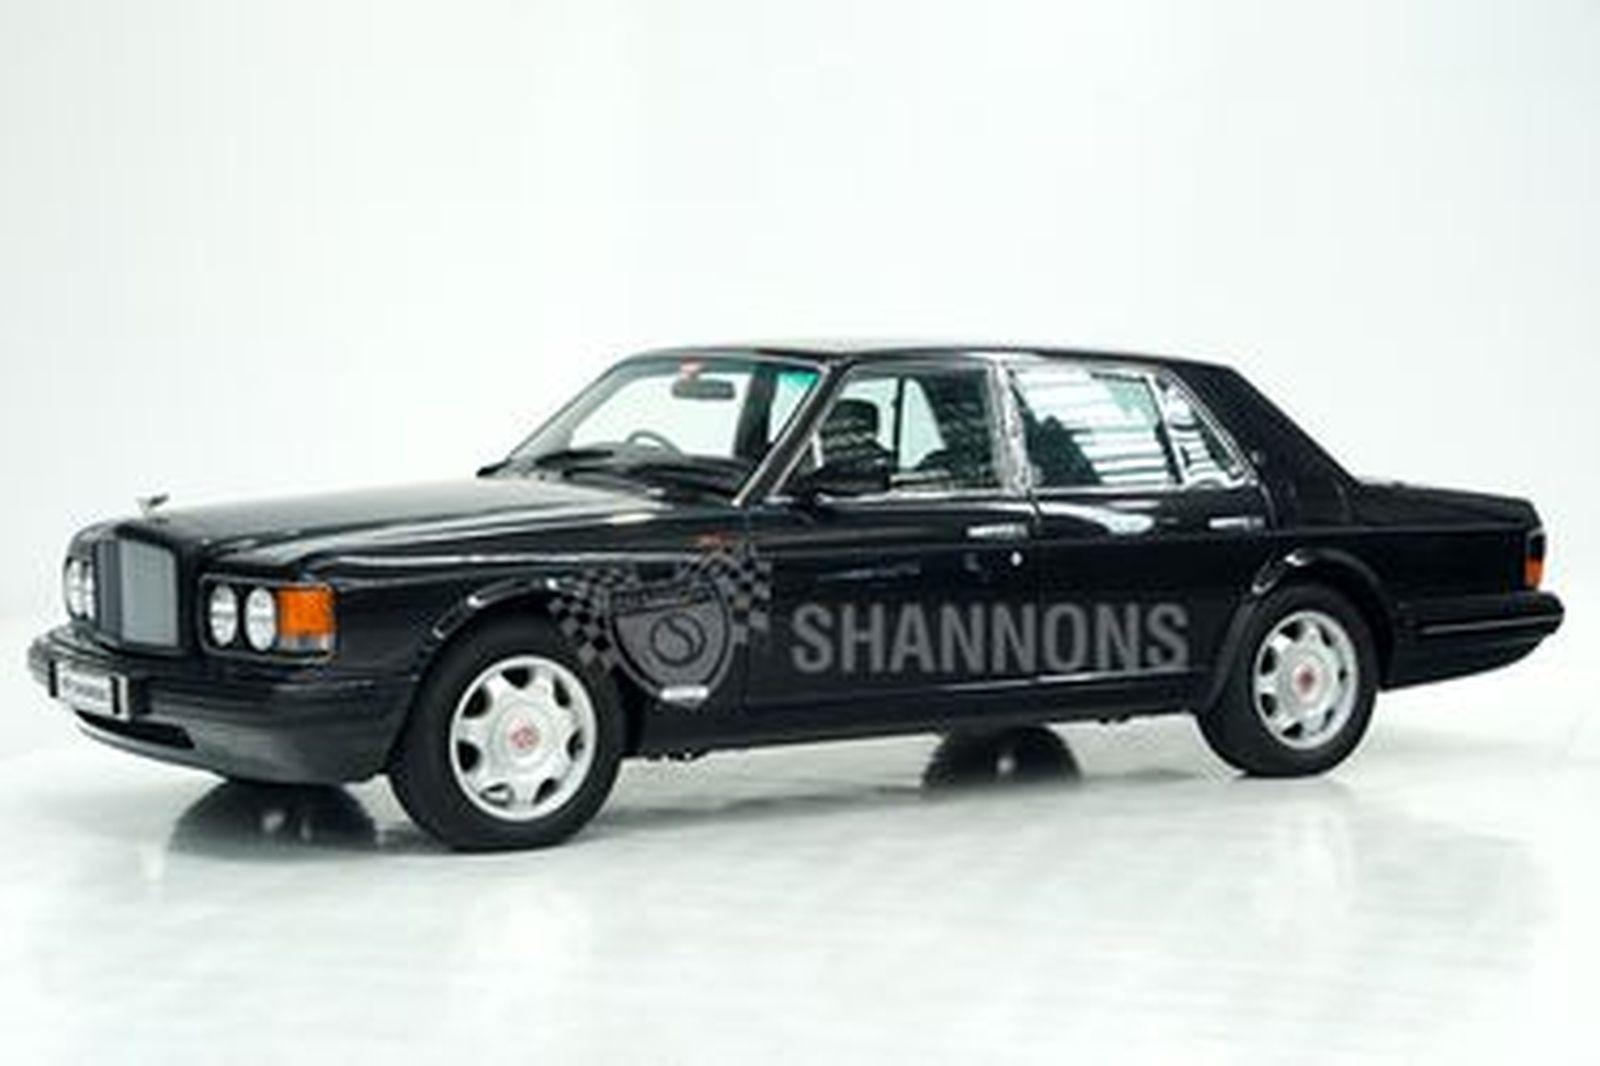 Bentley Brooklands V8 'Turbo' Saloon